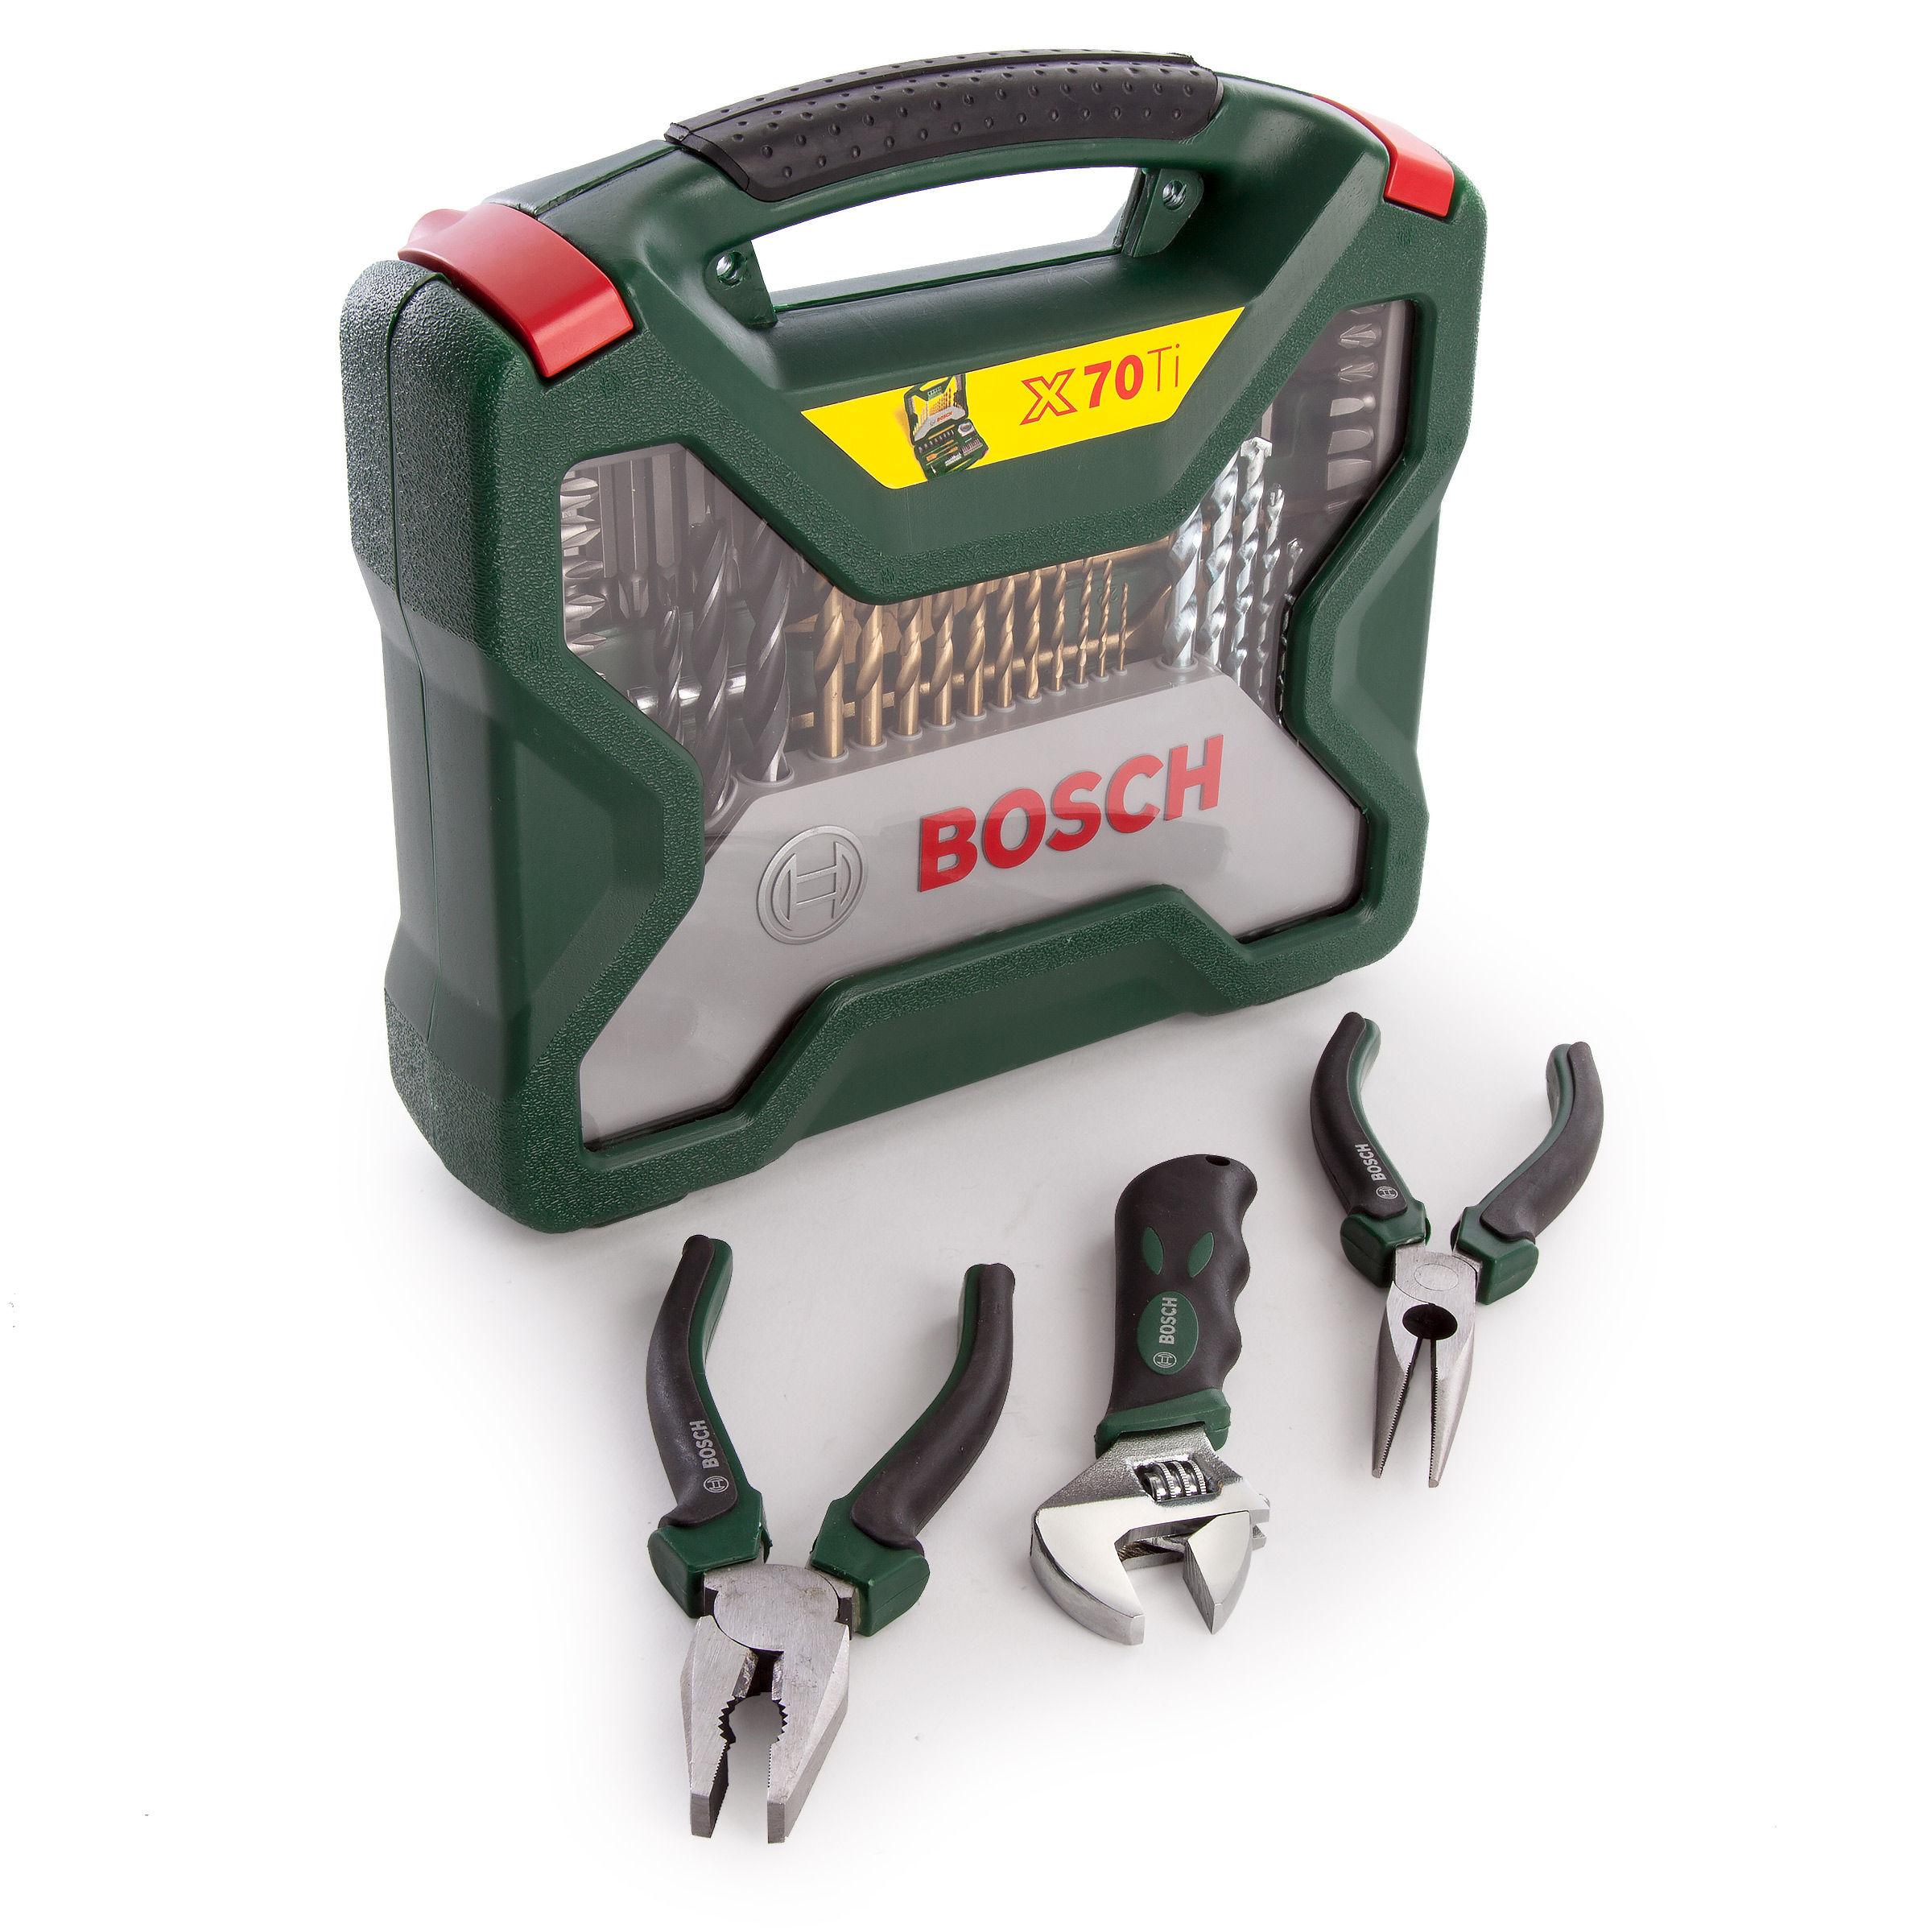 Favoriete Toolstop Bosch 2607017197 Universal X-Line Titanium Drill and Bit OF16